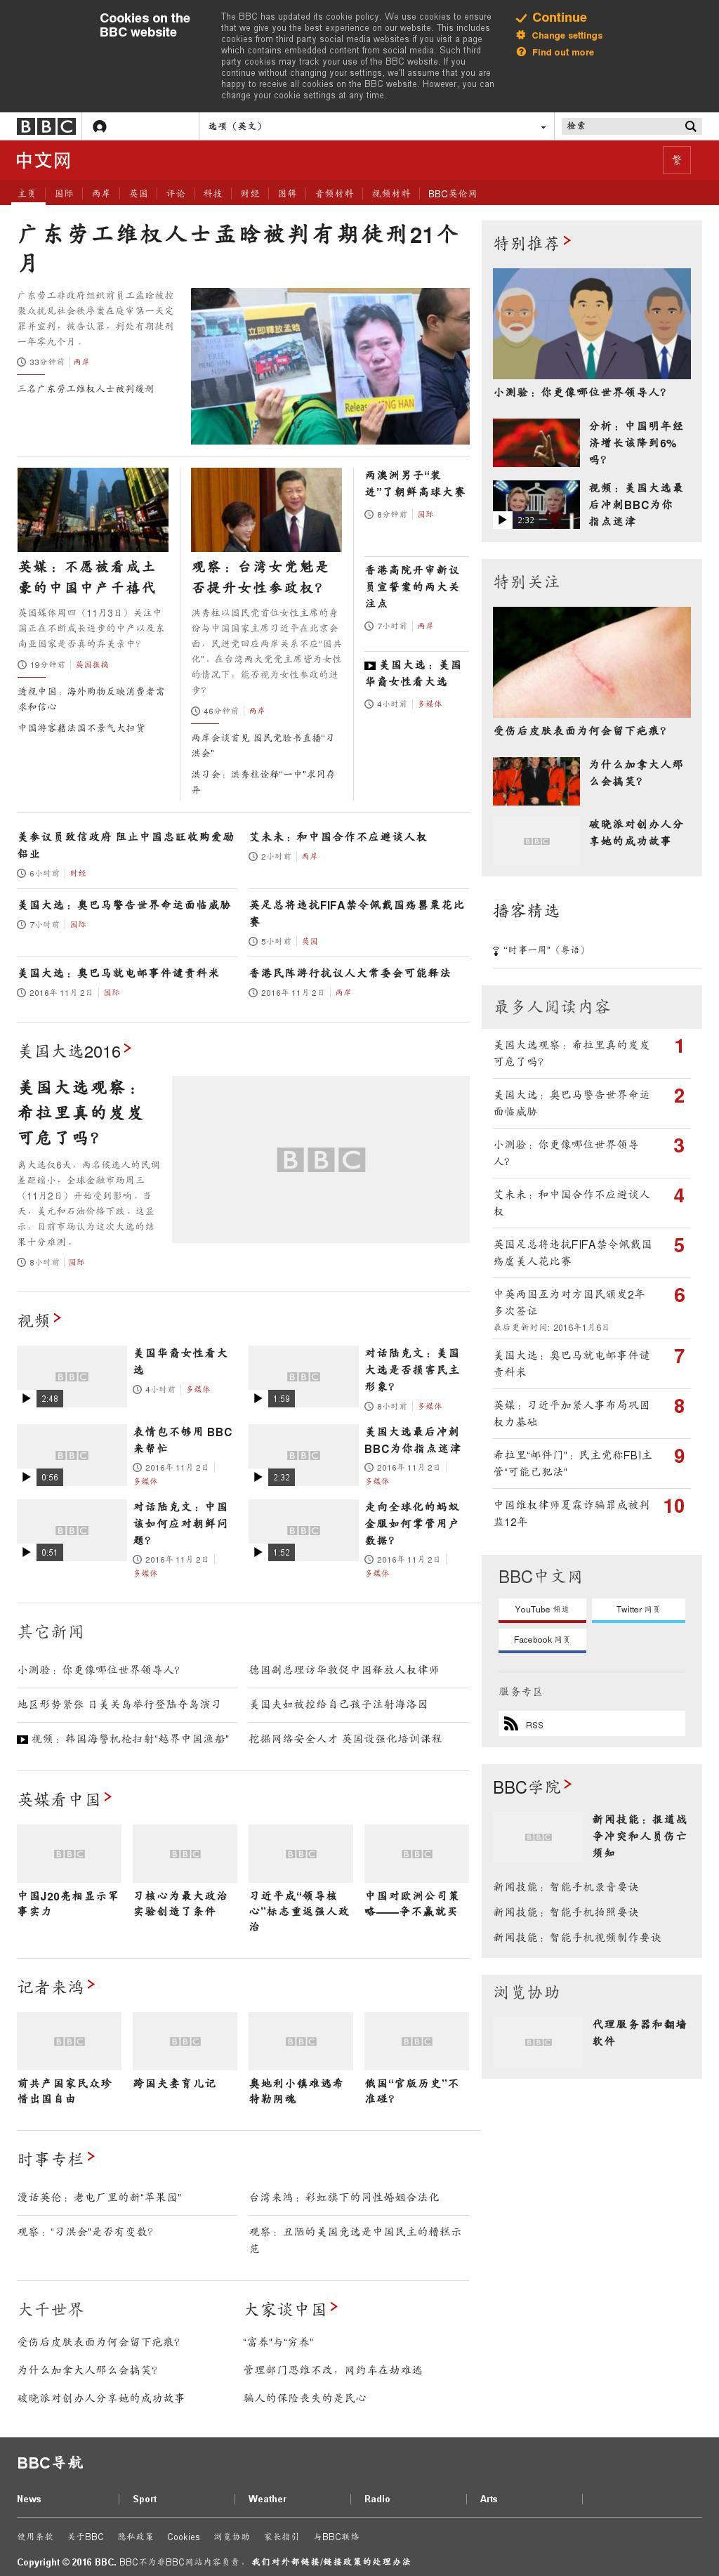 BBC (Chinese) at Thursday Nov. 3, 2016, 11 a.m. UTC